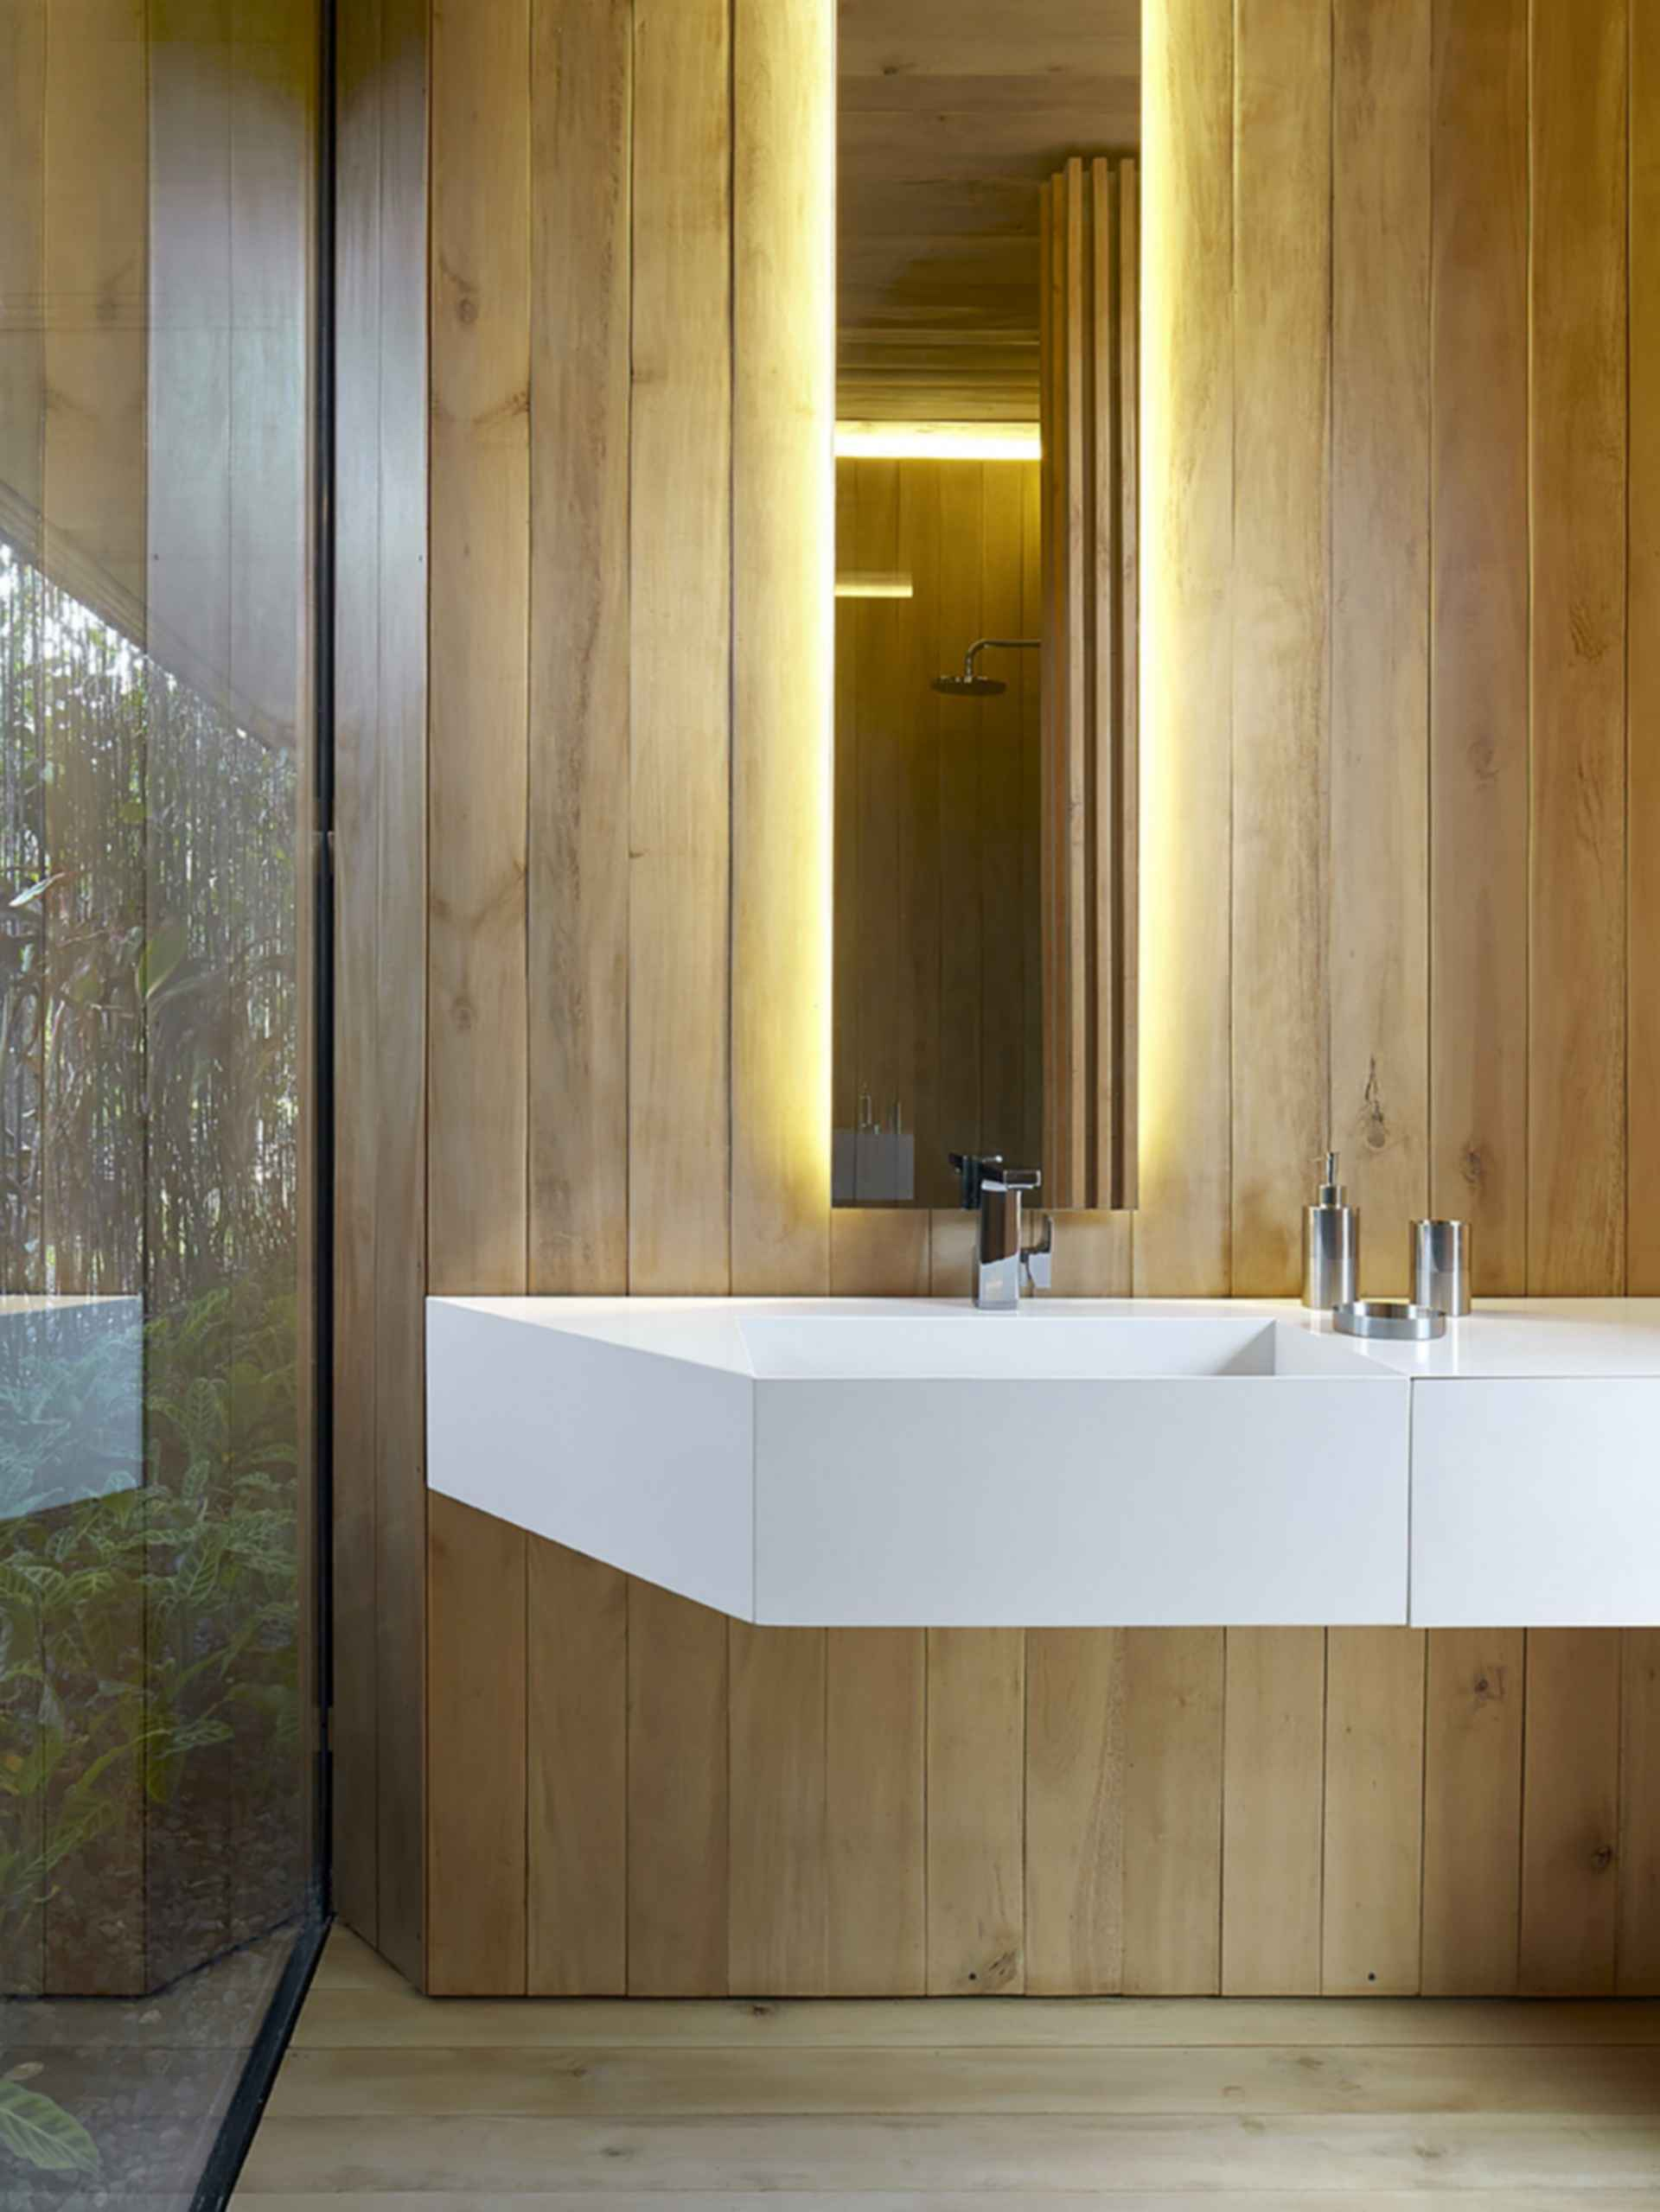 INOUT House - Bathroom